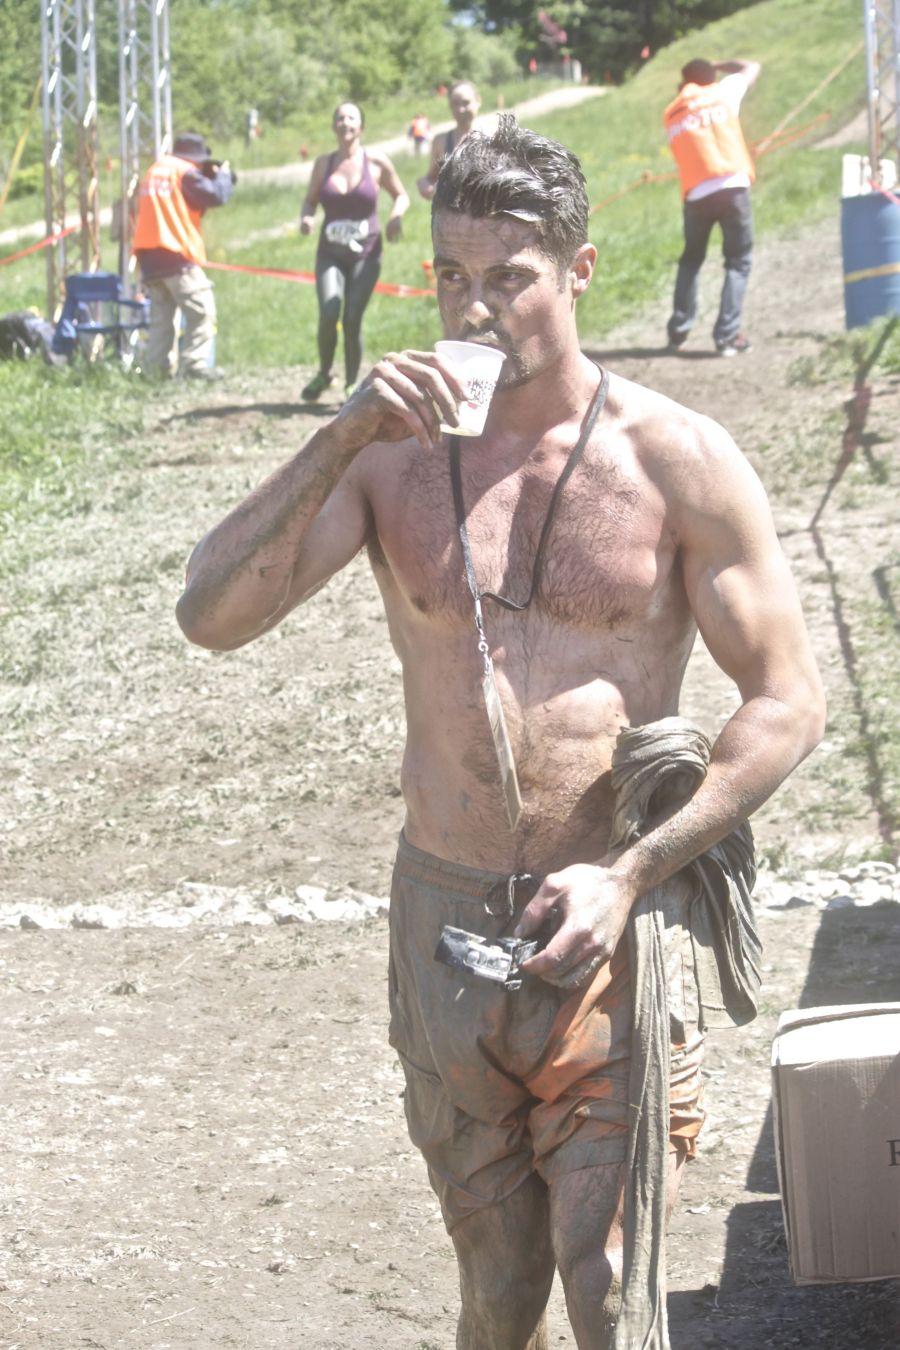 amesbury warrior dash may 31 4